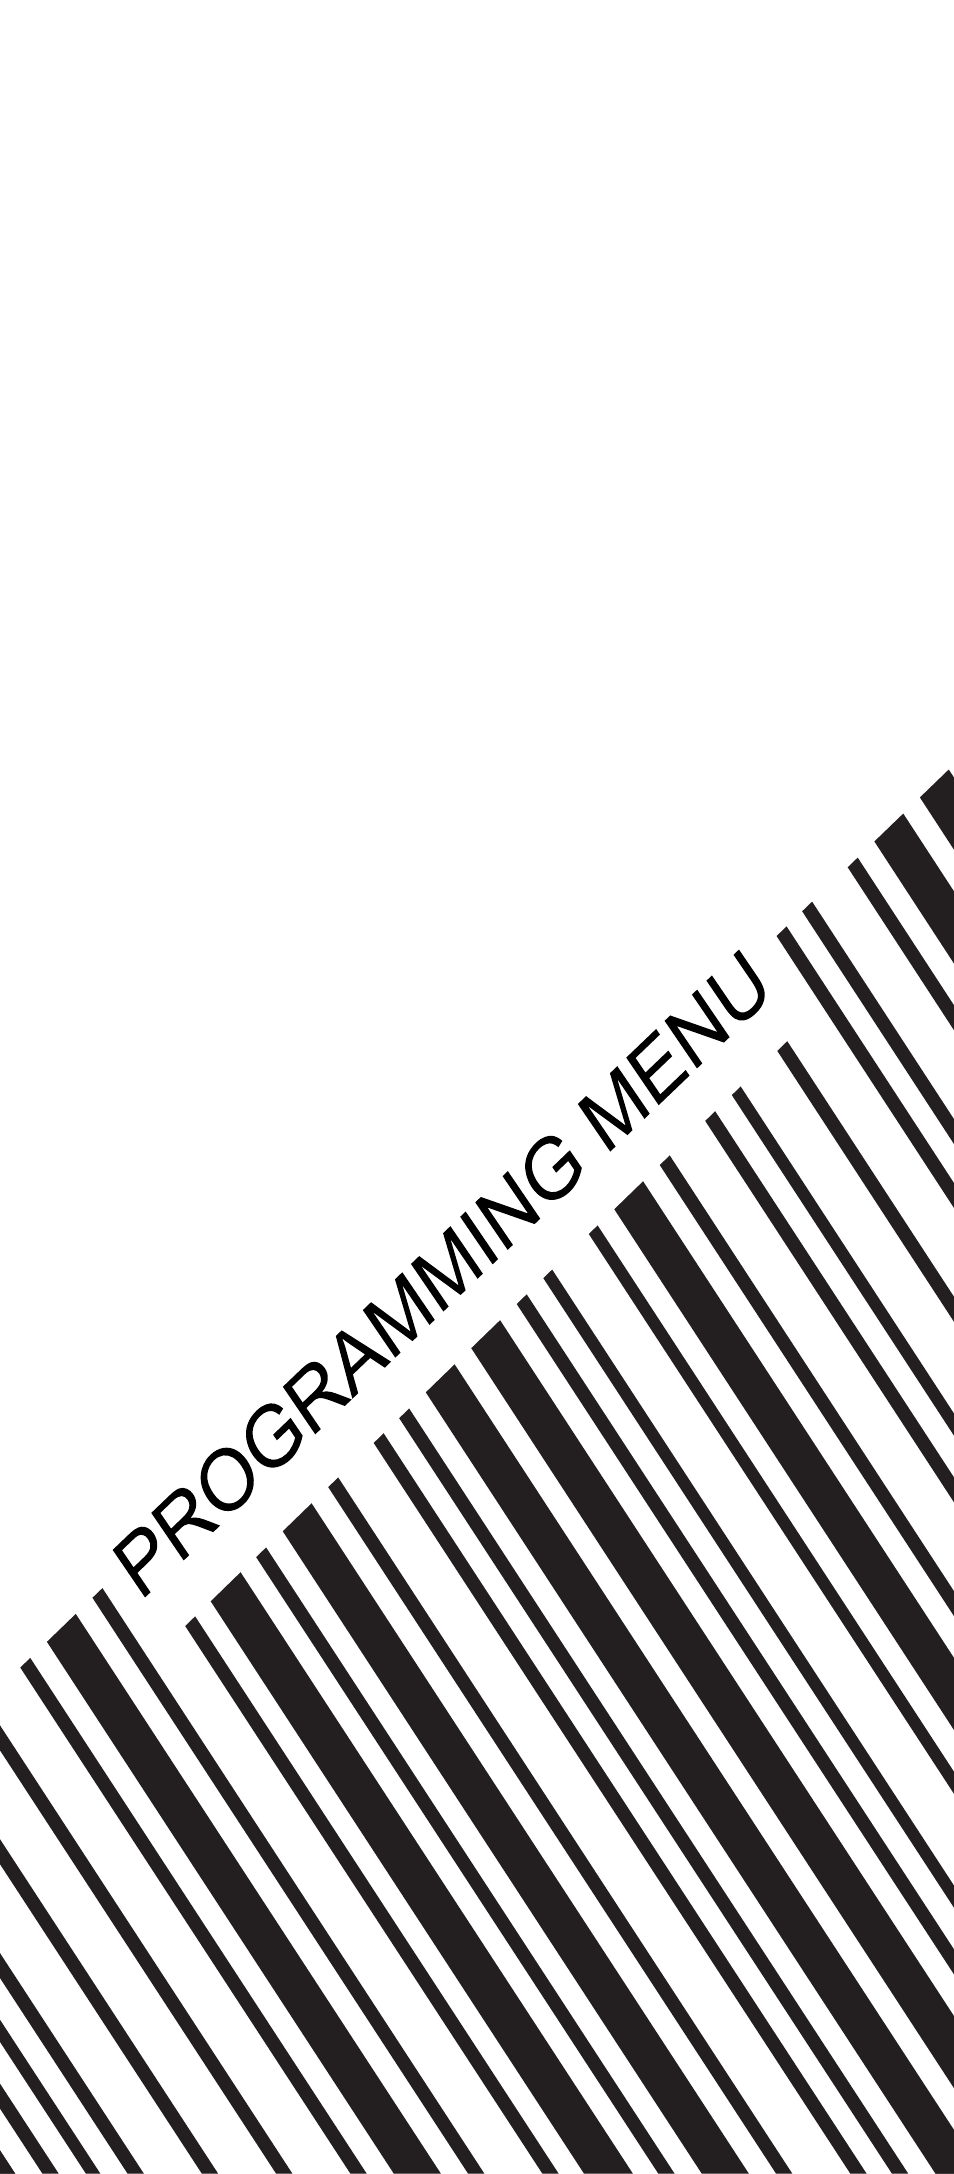 Manhattan ccd barcode scanner manual mydrlynx manhattan 460835 long range ccd barcode scanner programming menu user manual 74 pages buycottarizona Gallery